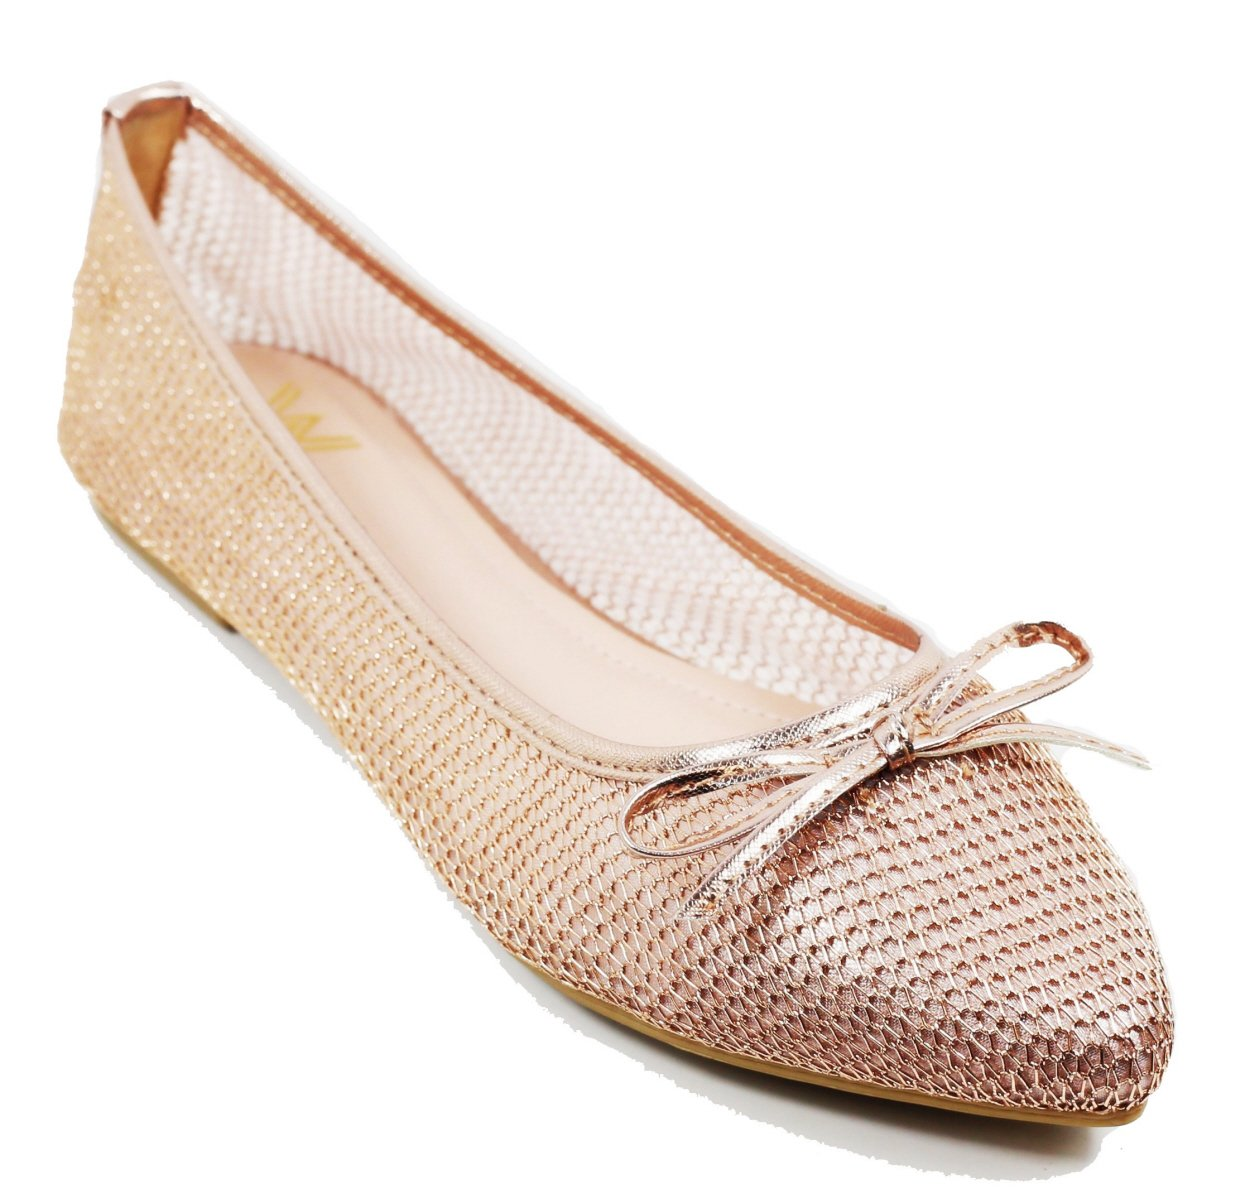 Walstar wedding shoes for bride Flat Shoes Mesh Flat Shoes B073WHVY1K 7.5 B(M) US|Gold